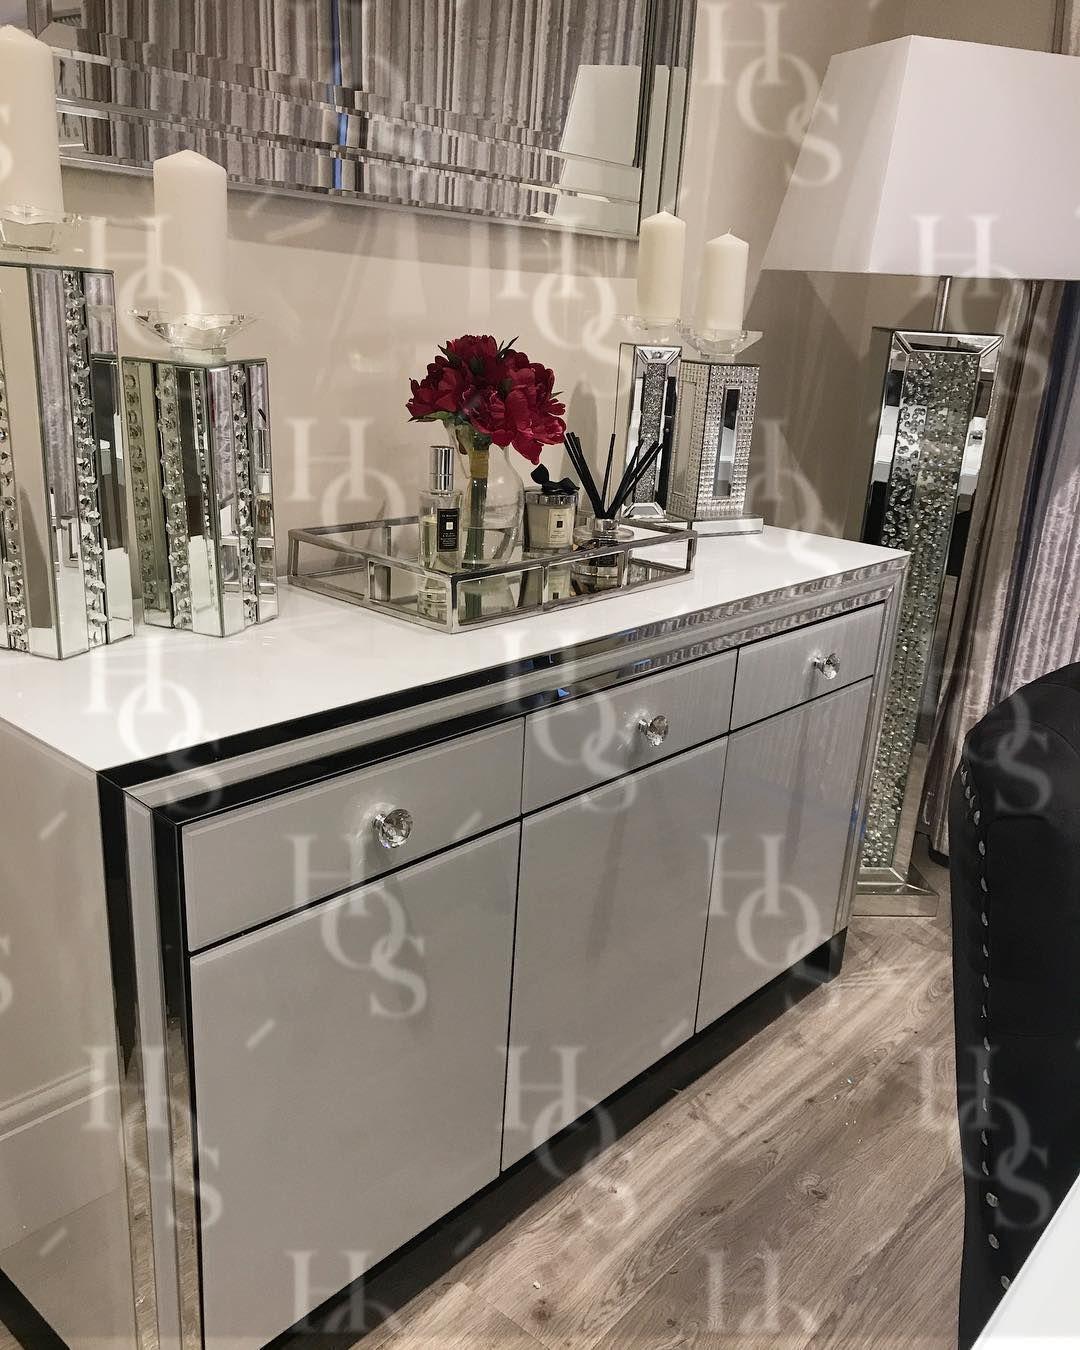 Glamorous Furniture Store Live the Luxury LifeWe design